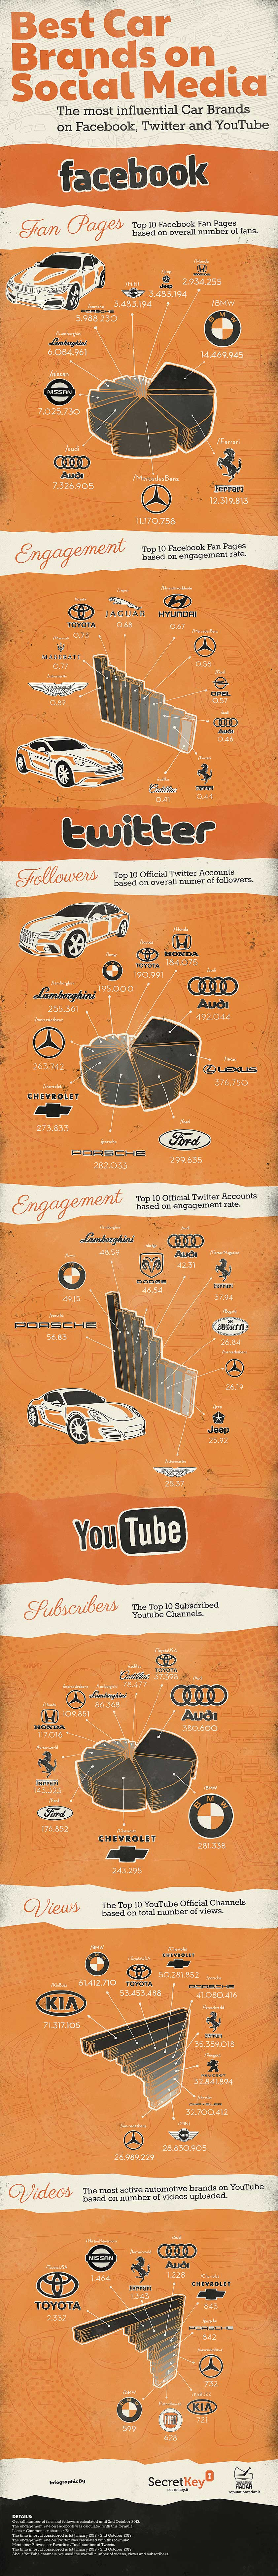 best-car-brands-on-social-media_5264eb64074b0